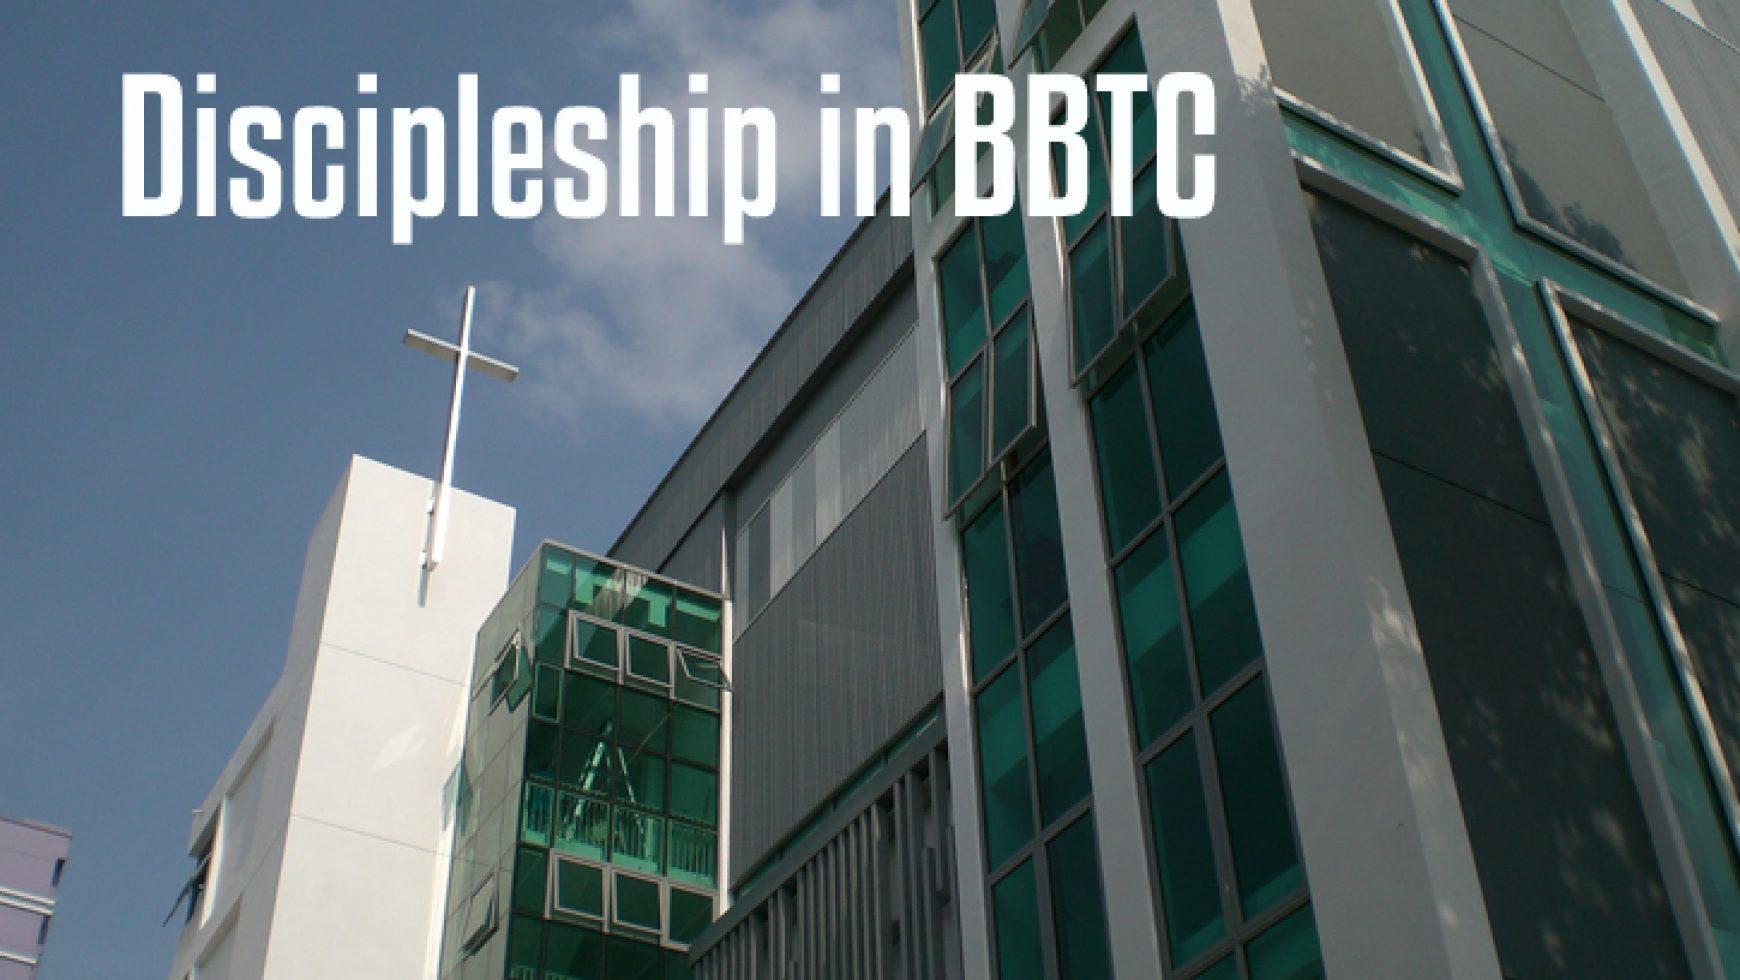 Discipleship in BBTC